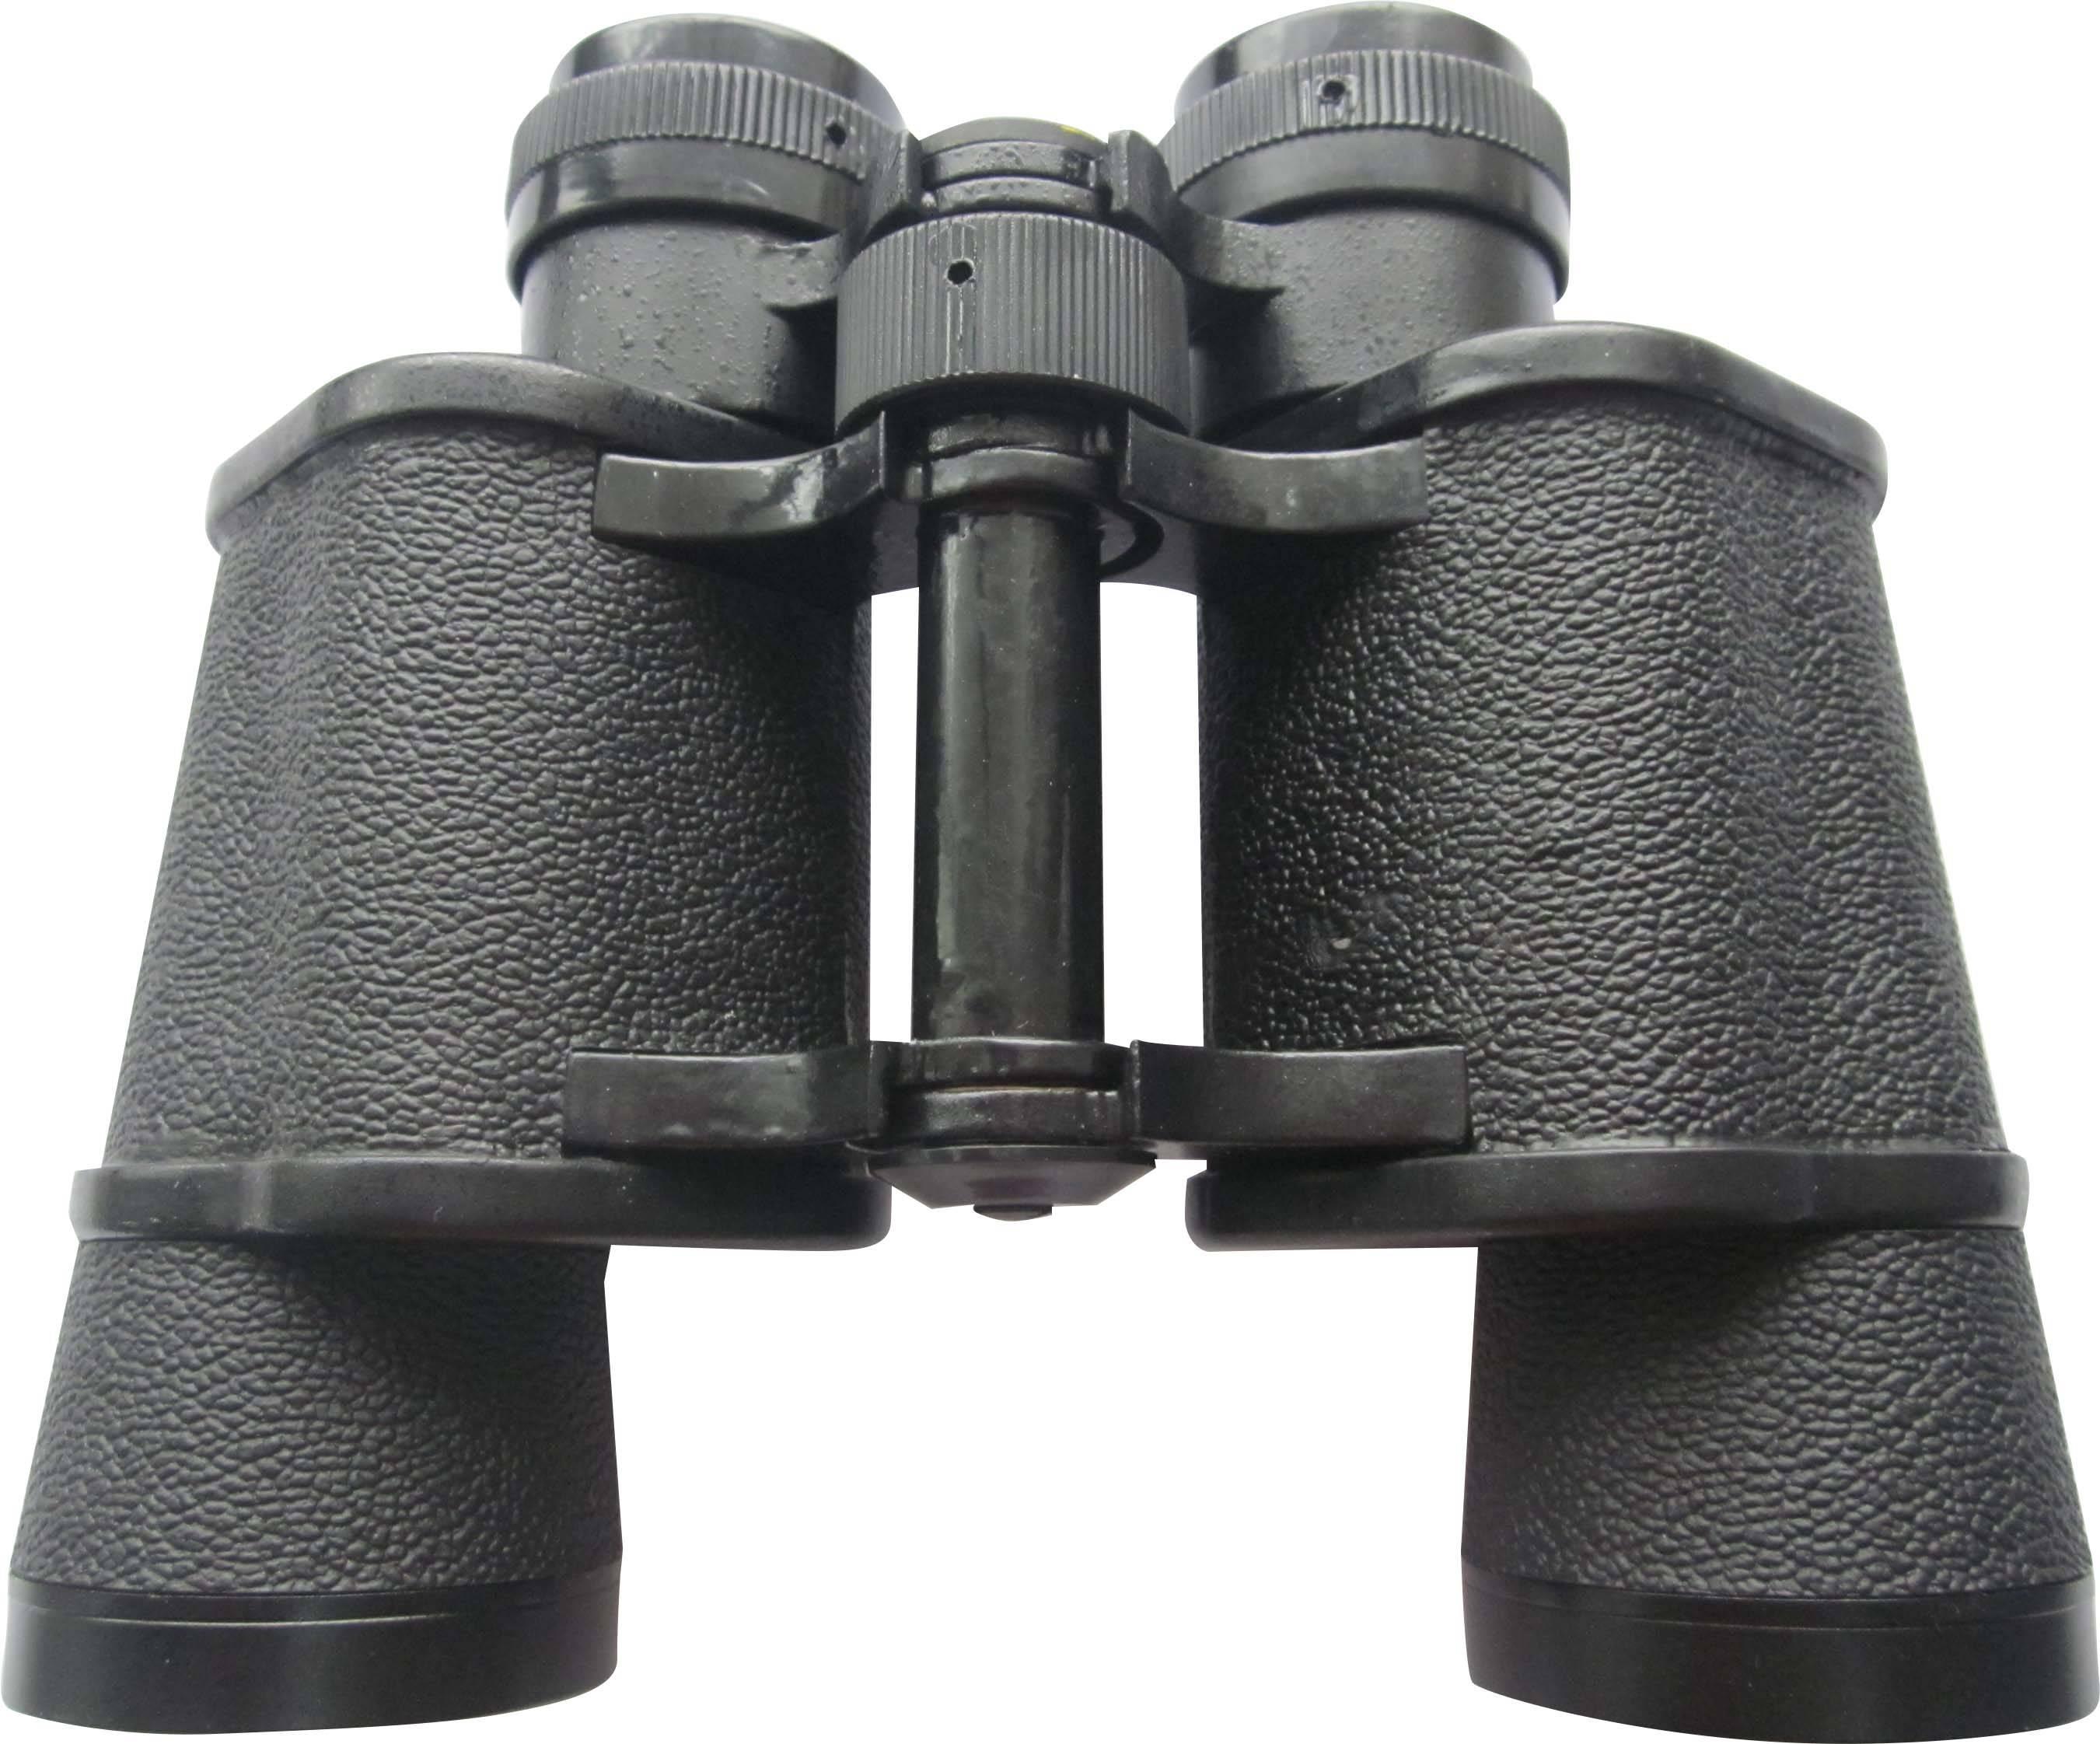 (BM-5018) 10-40X40 wide angle long distance outdoor binoculars